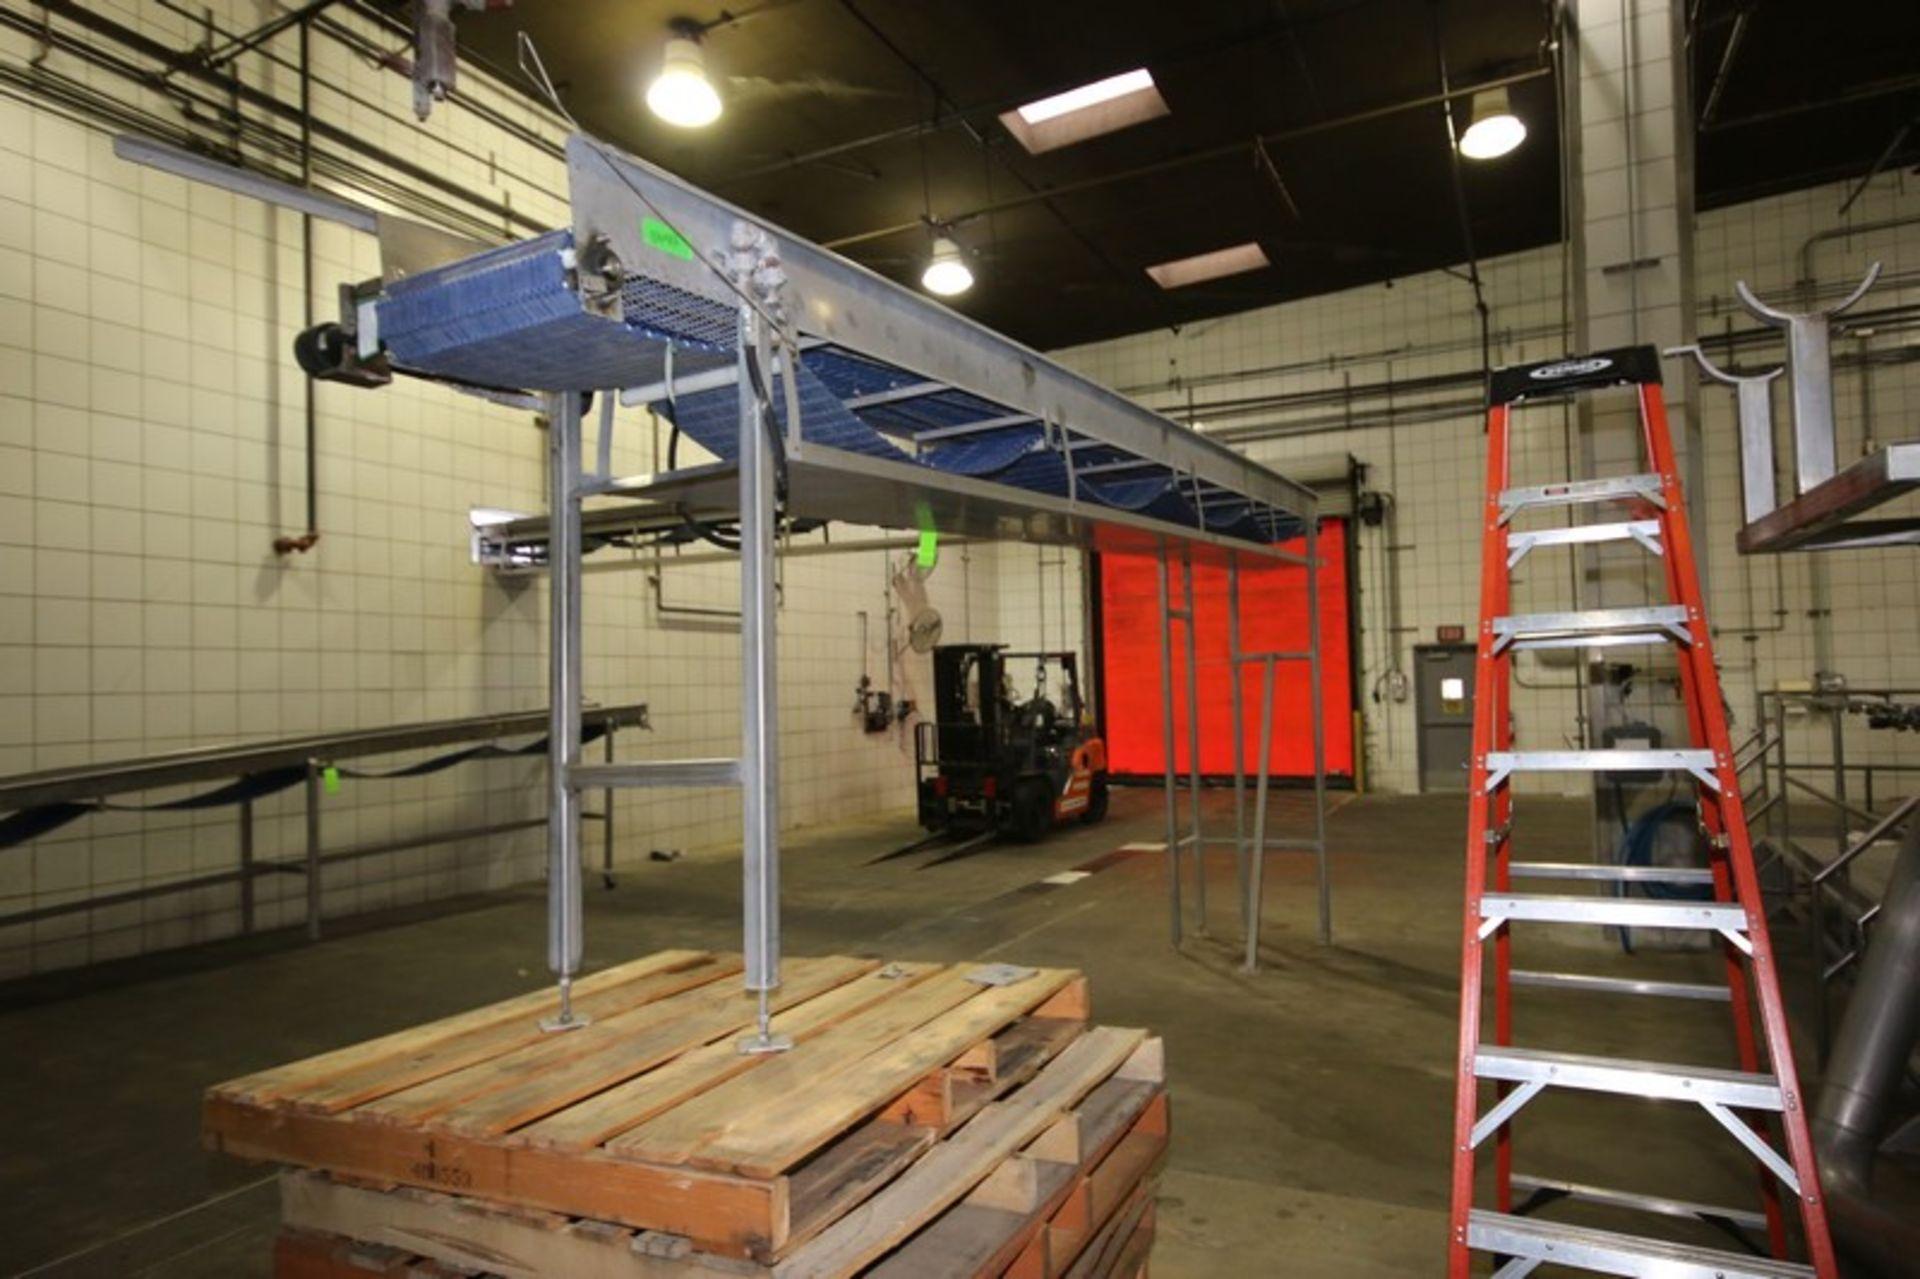 "Lot 39 - S/S Overhead Conveyor, Aprox. 23' L x 18"" W Belt, S/S Legs & Walls, Hydraulic Operated"